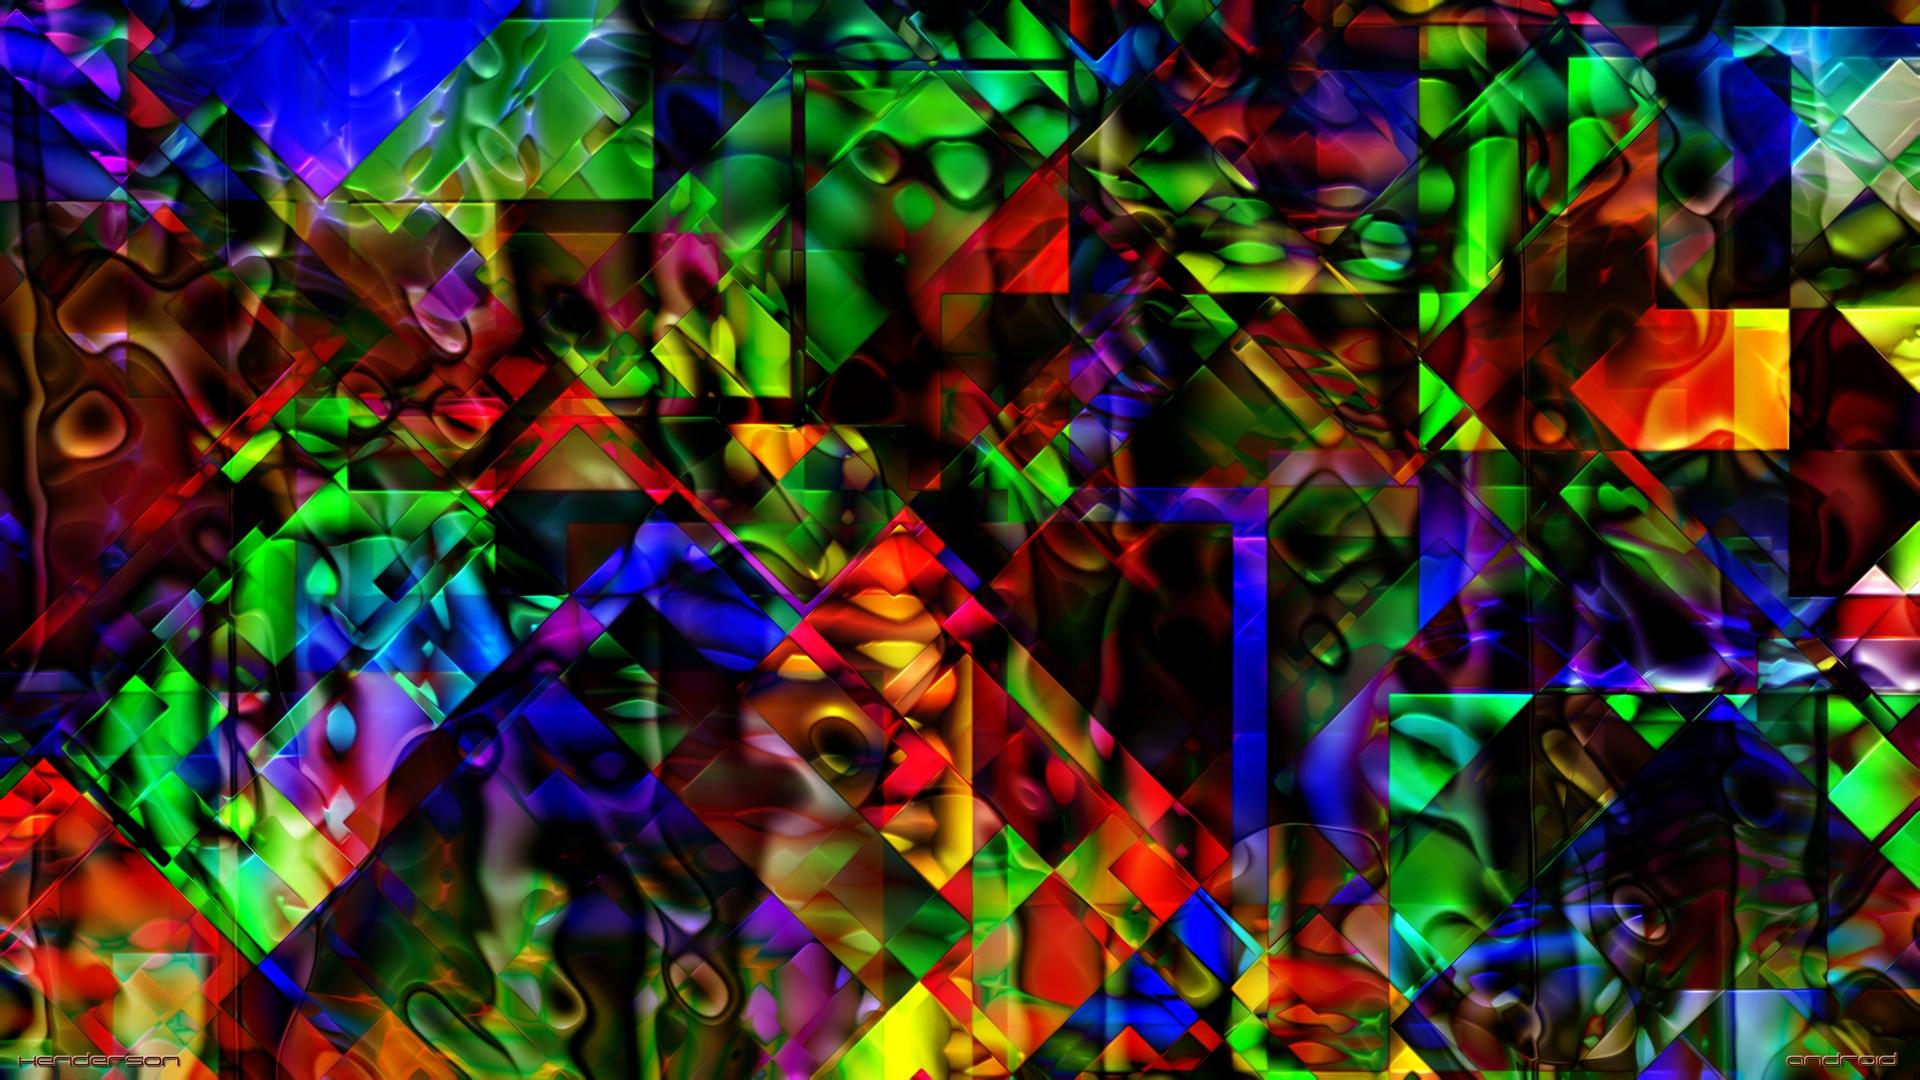 3d Mushroom Trip Wallpaper Psychedelic Hd Wallpaper Background Image 1920x1080